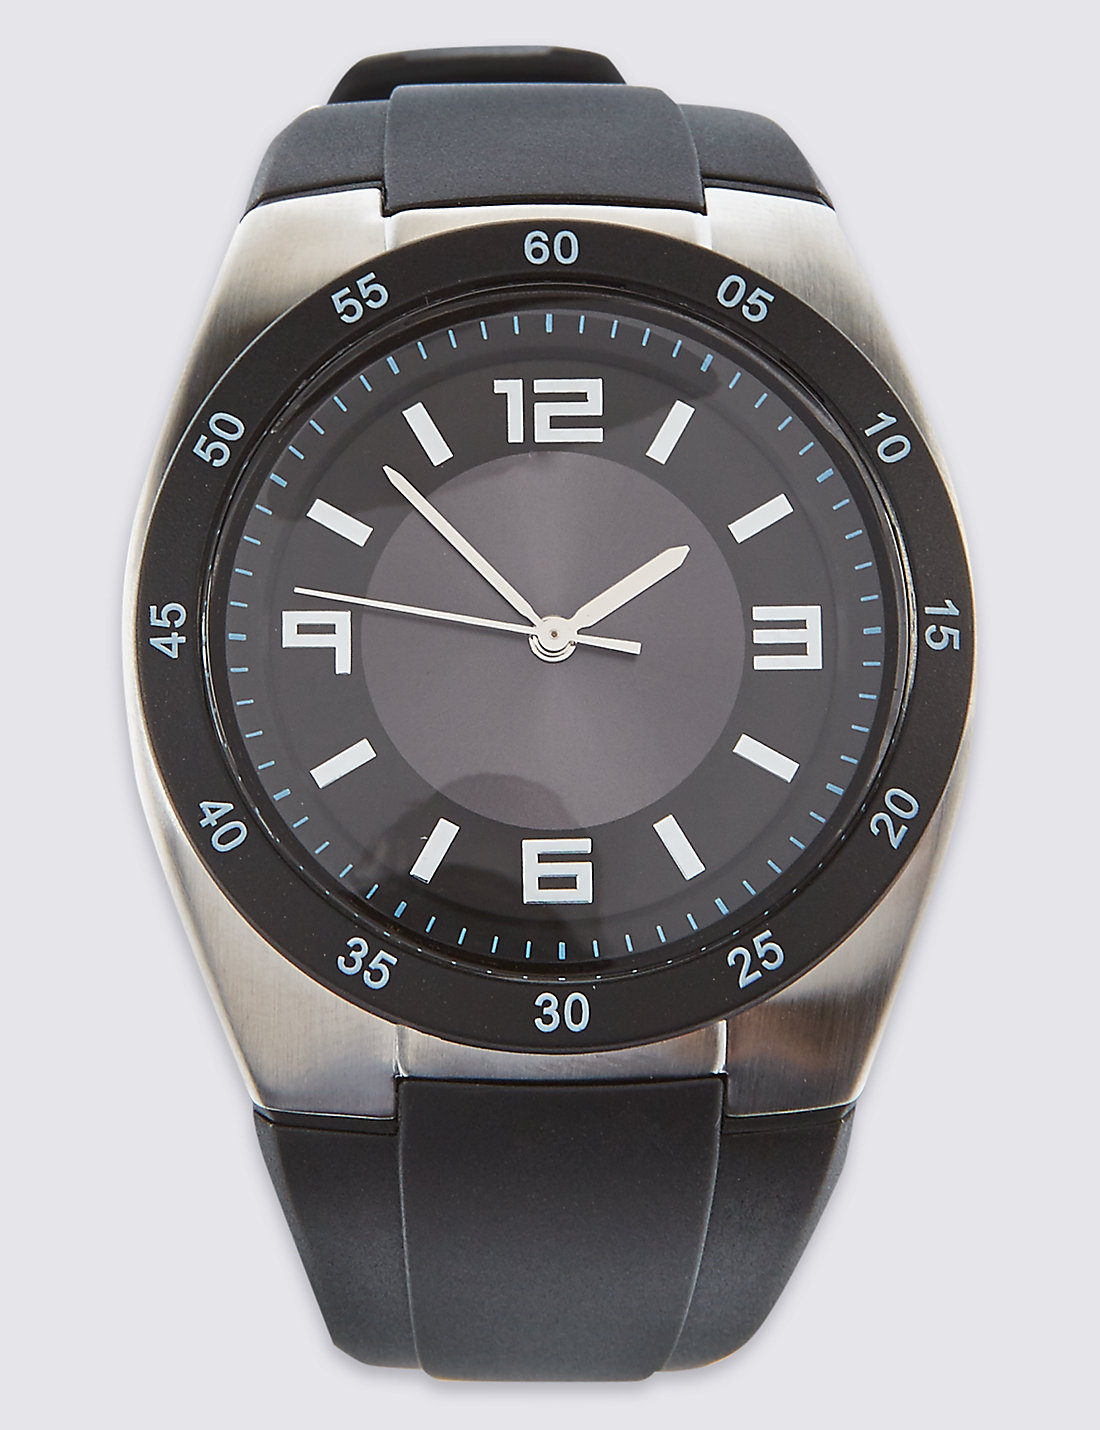 Watch marks on wrist - Silicone Sports Watch